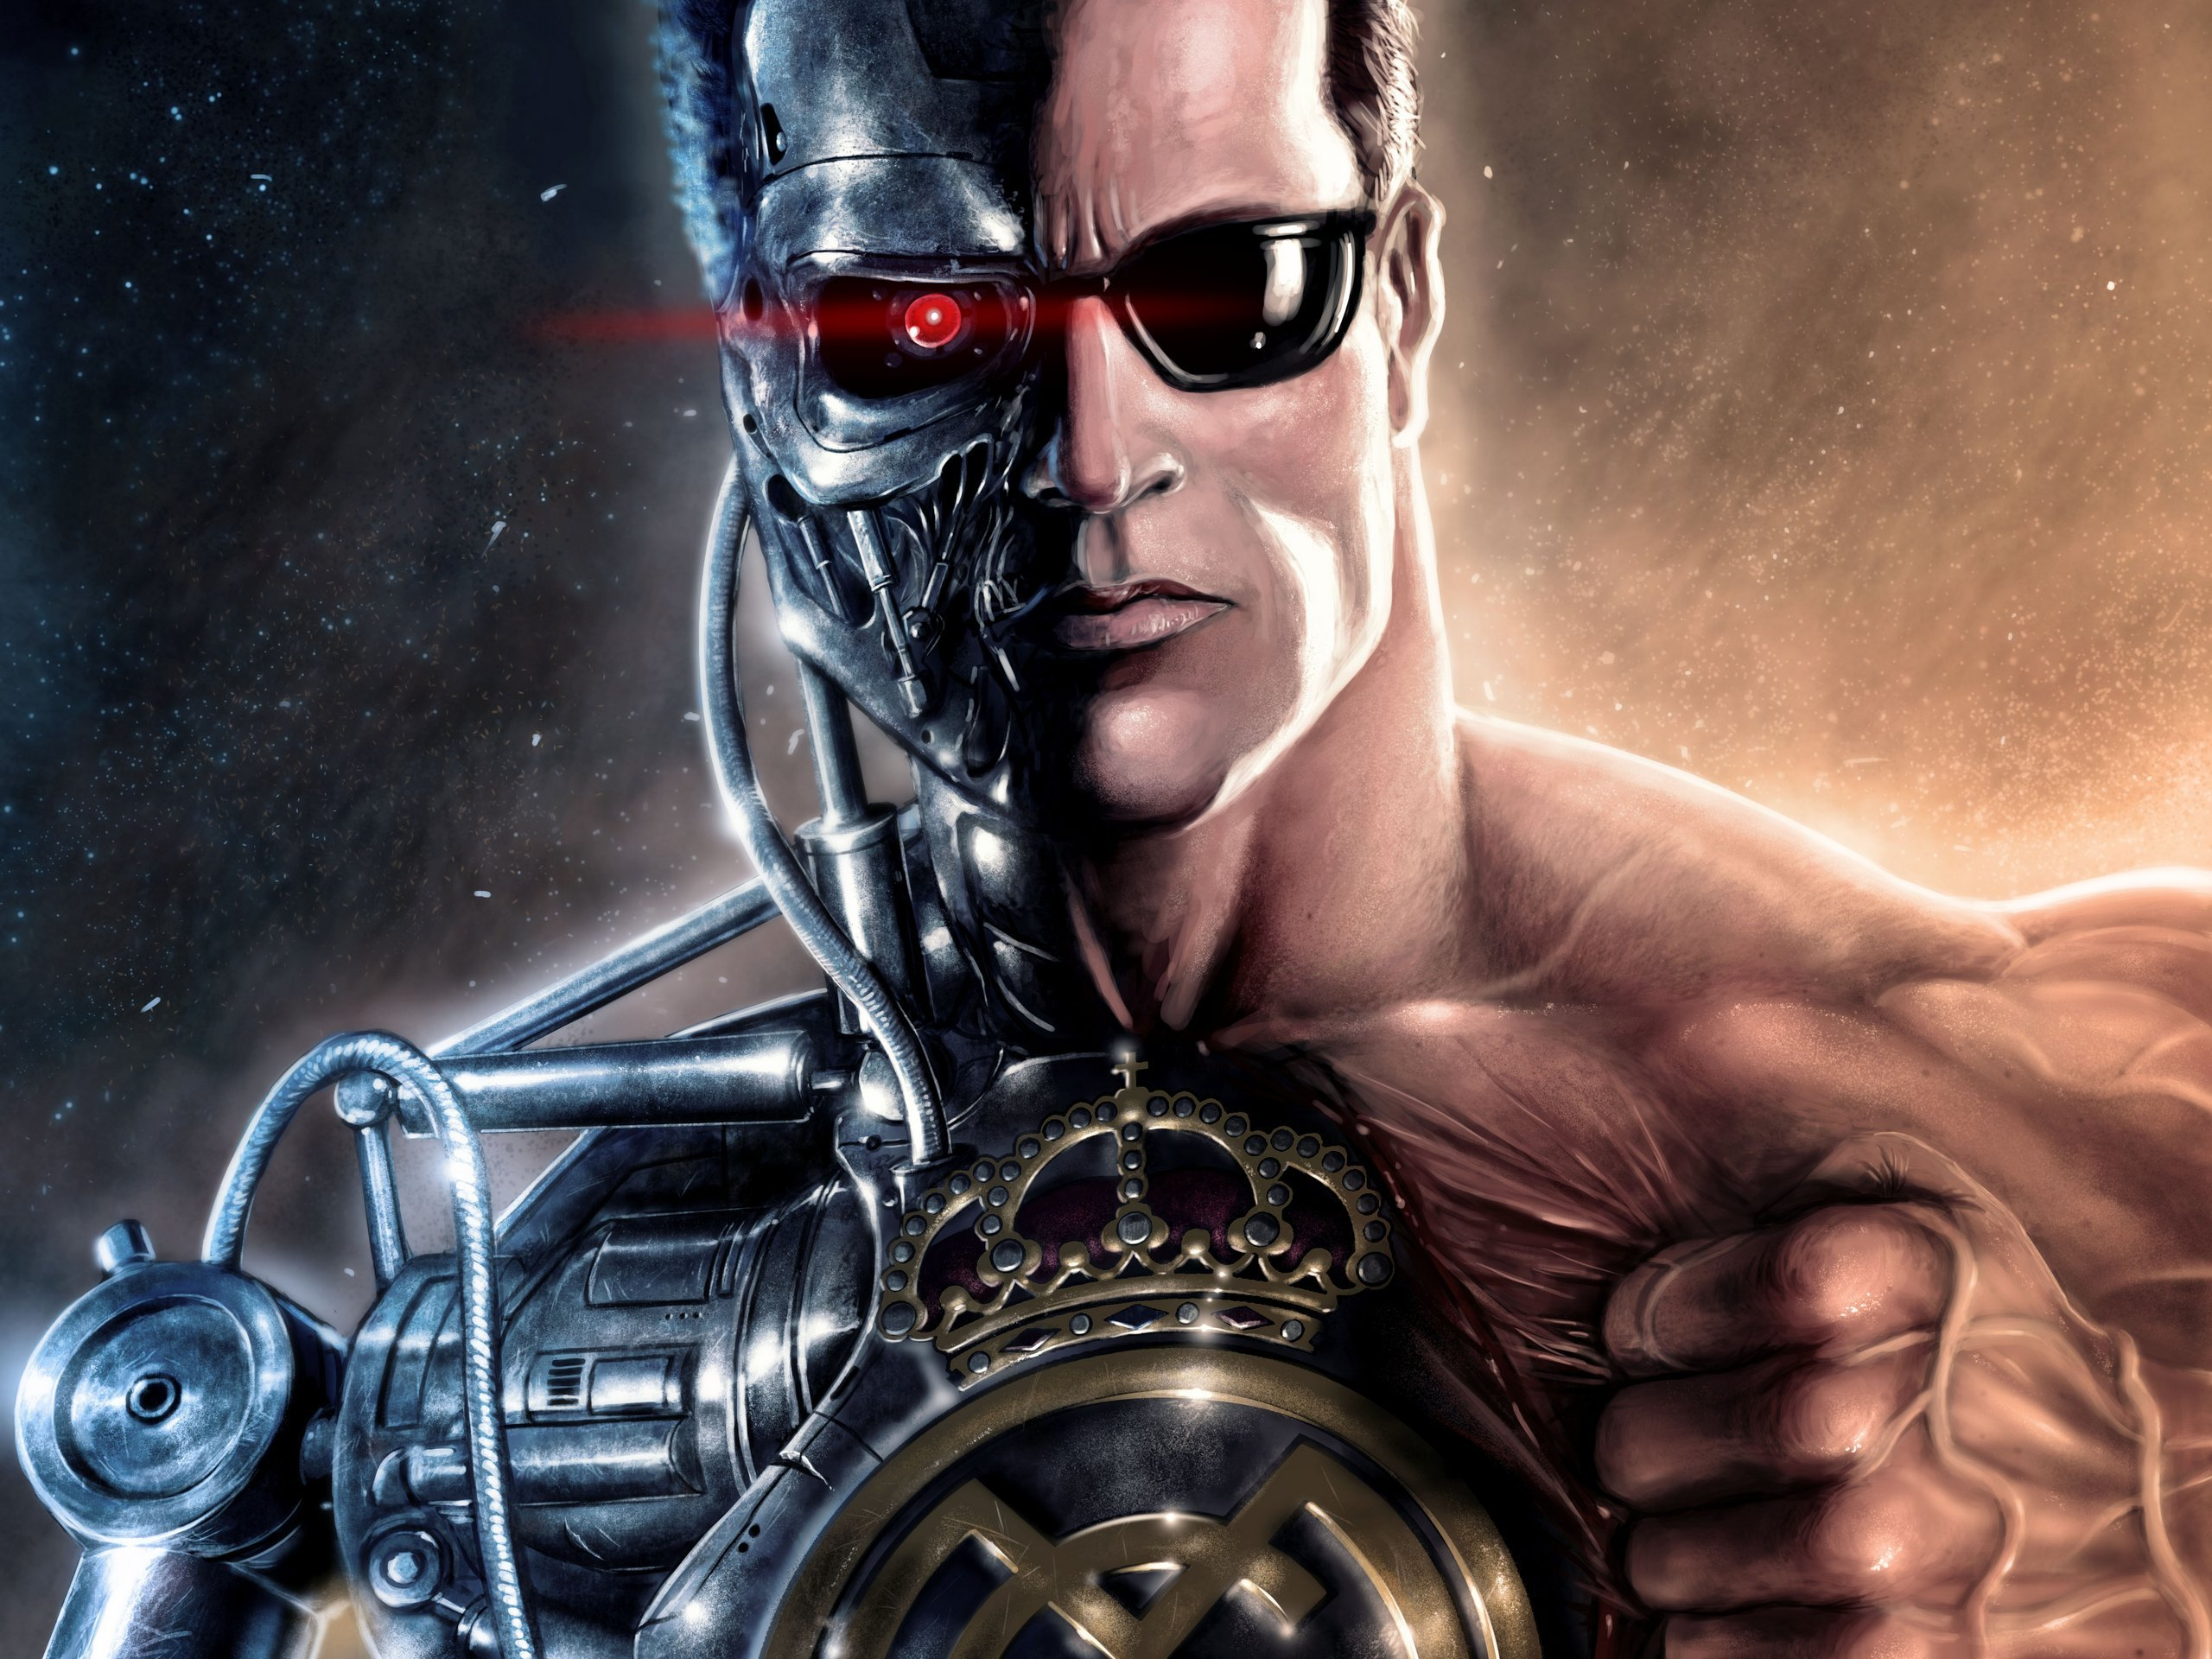 Cyborgs photo